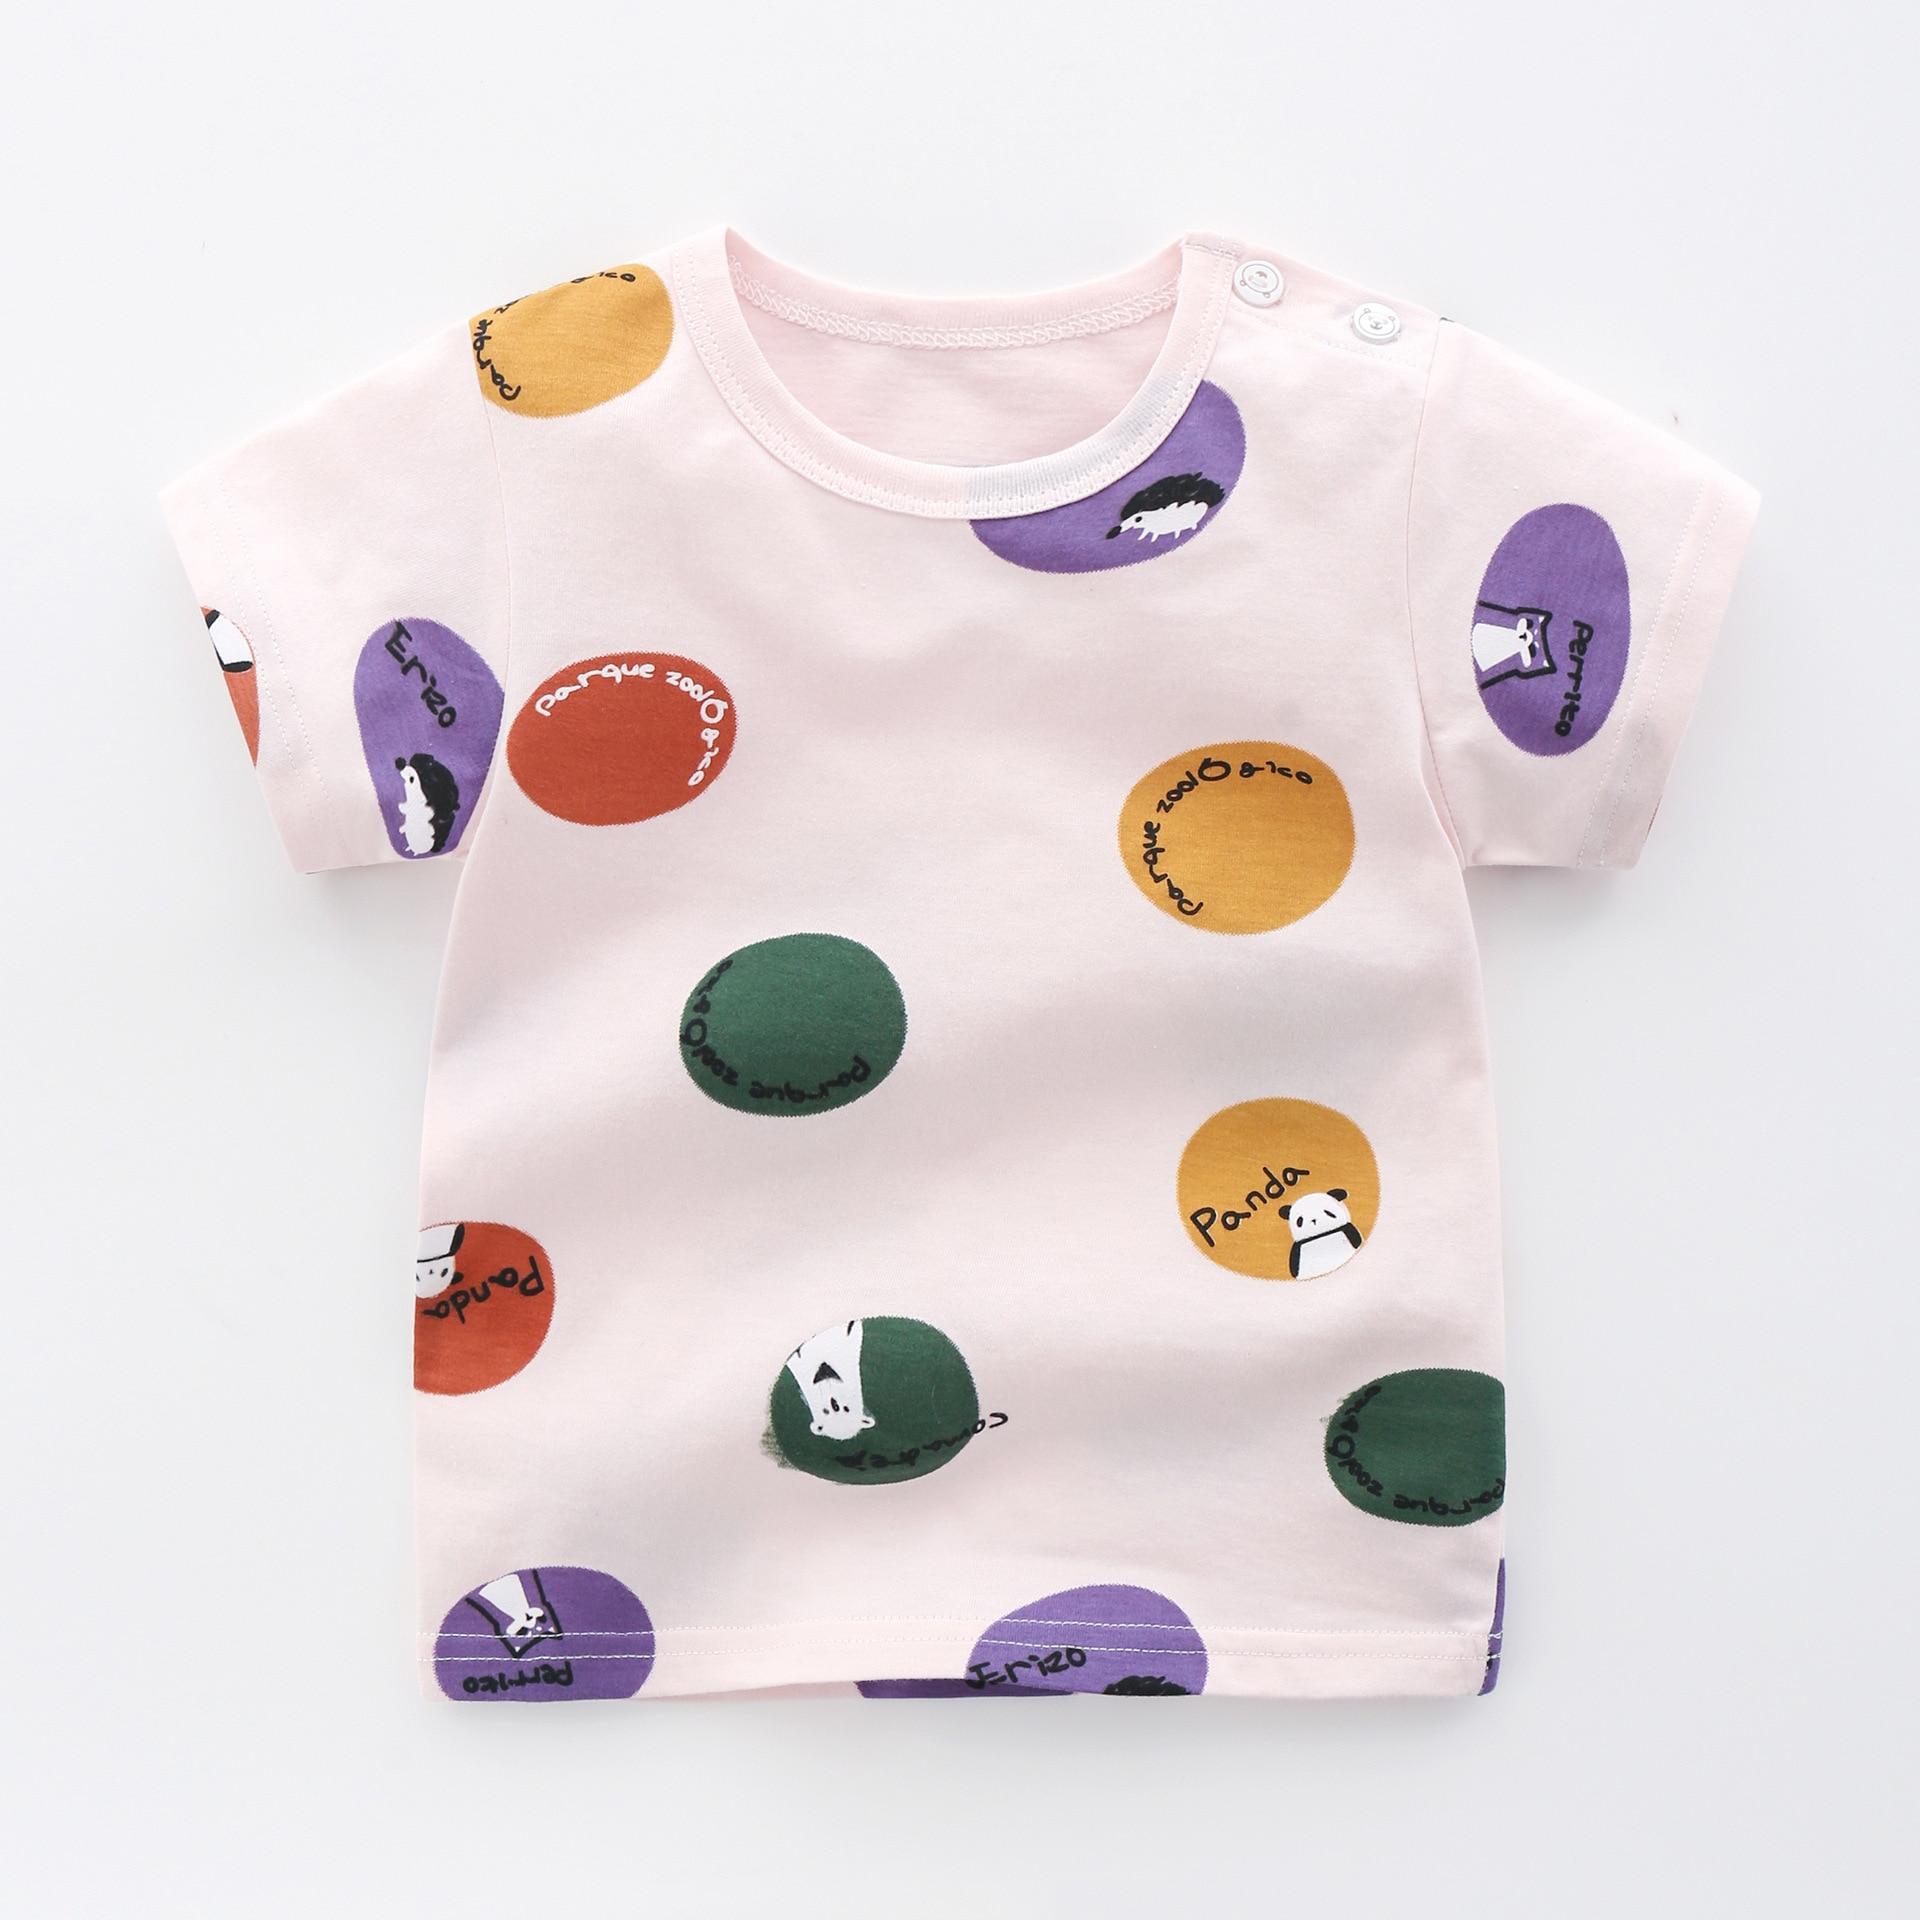 Summer Children's Wear Baby Kids T Shirts Girls Boys Clothes Tshirt Cotton Cartoon Printing Tops T-shirt Children Clothing-2